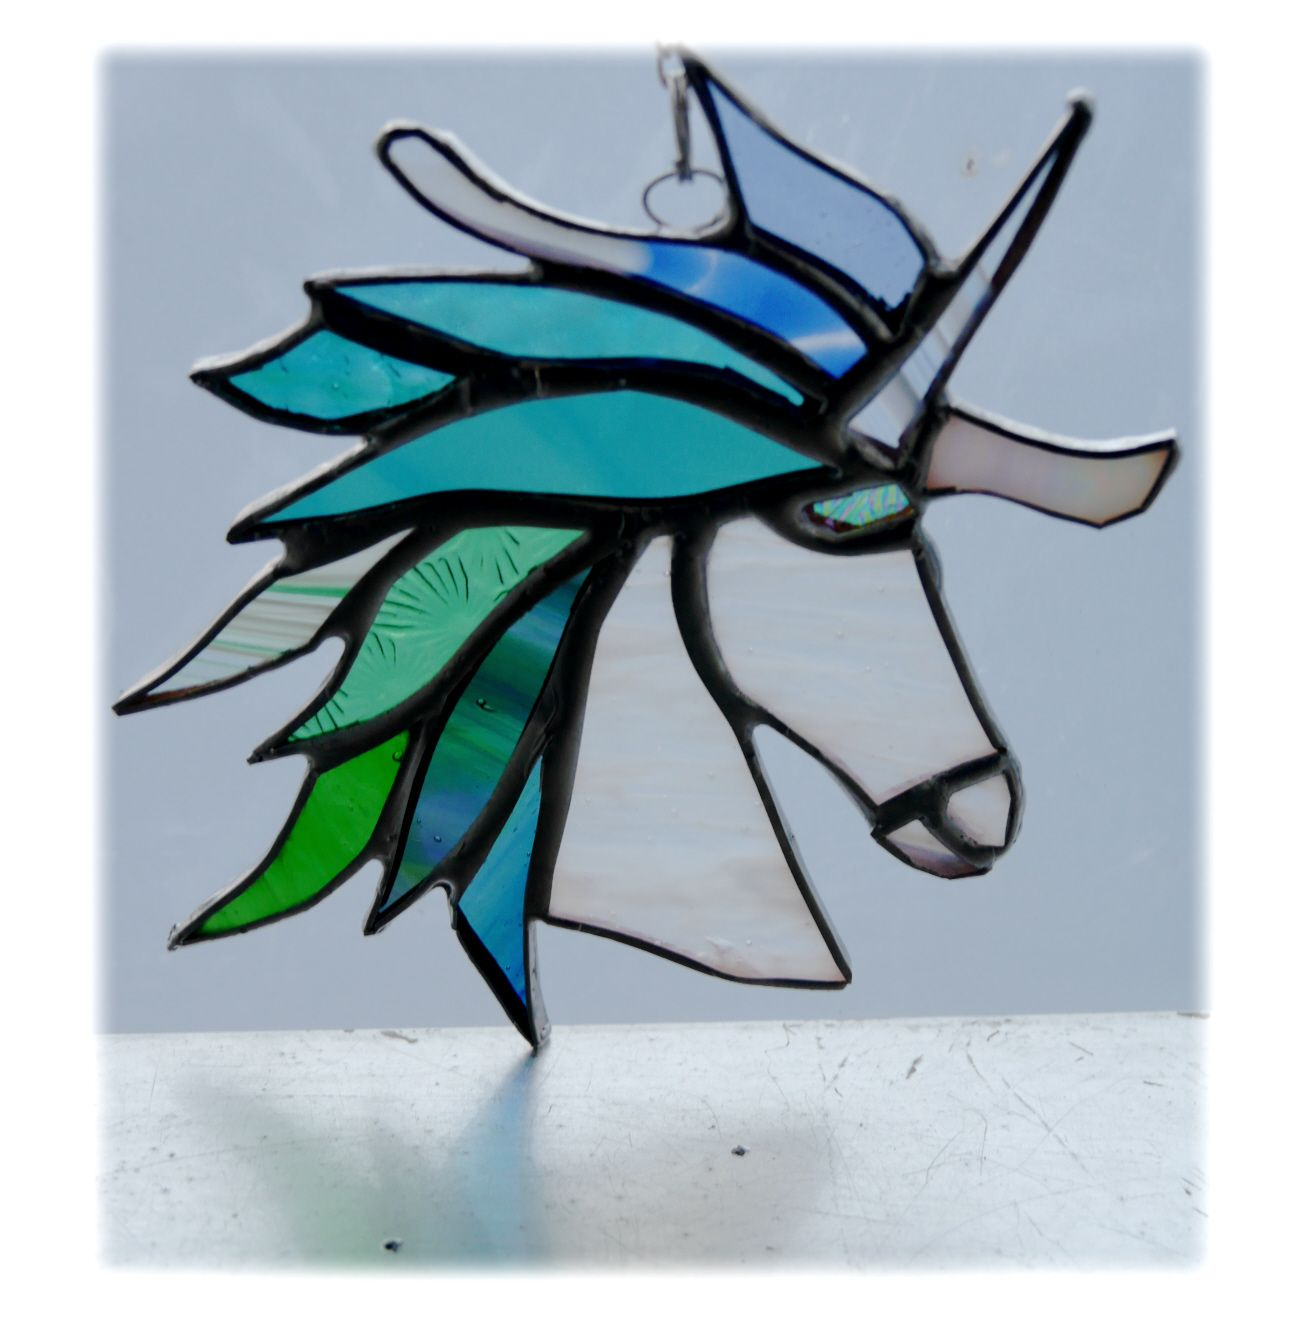 Unicorn 017 Aquas #1812 FREE 16.00